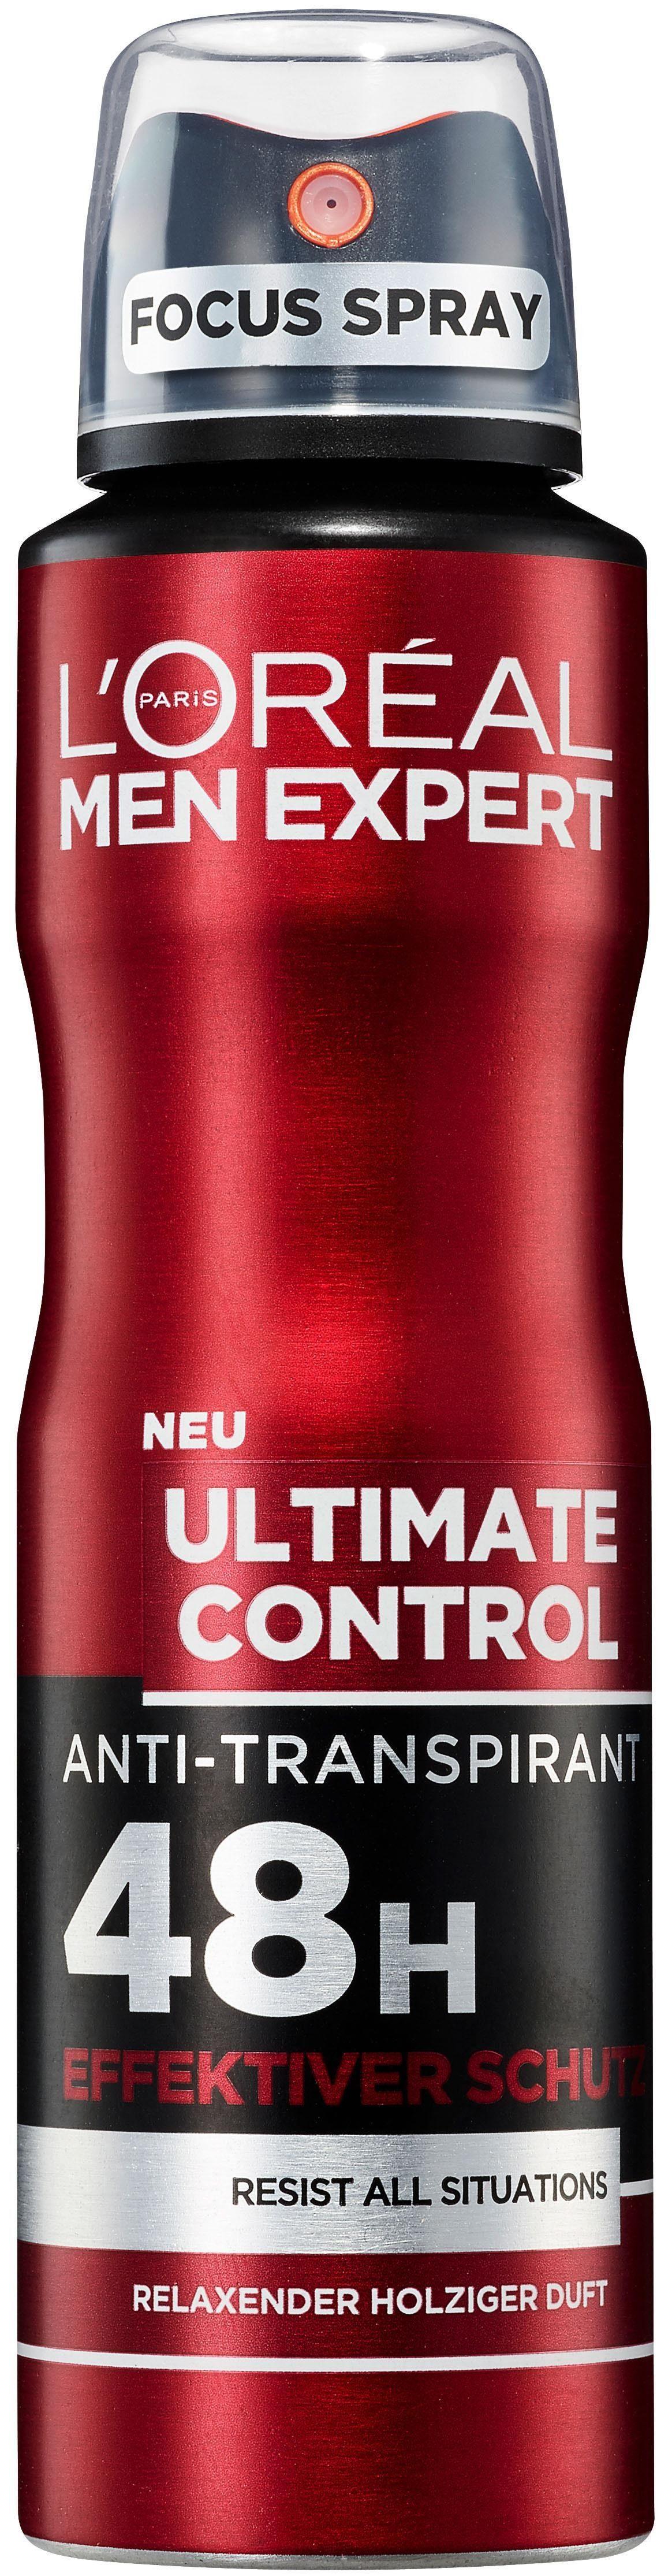 L'Oréal Paris Men Expert, »Ultimate Control«, Deo-Spray